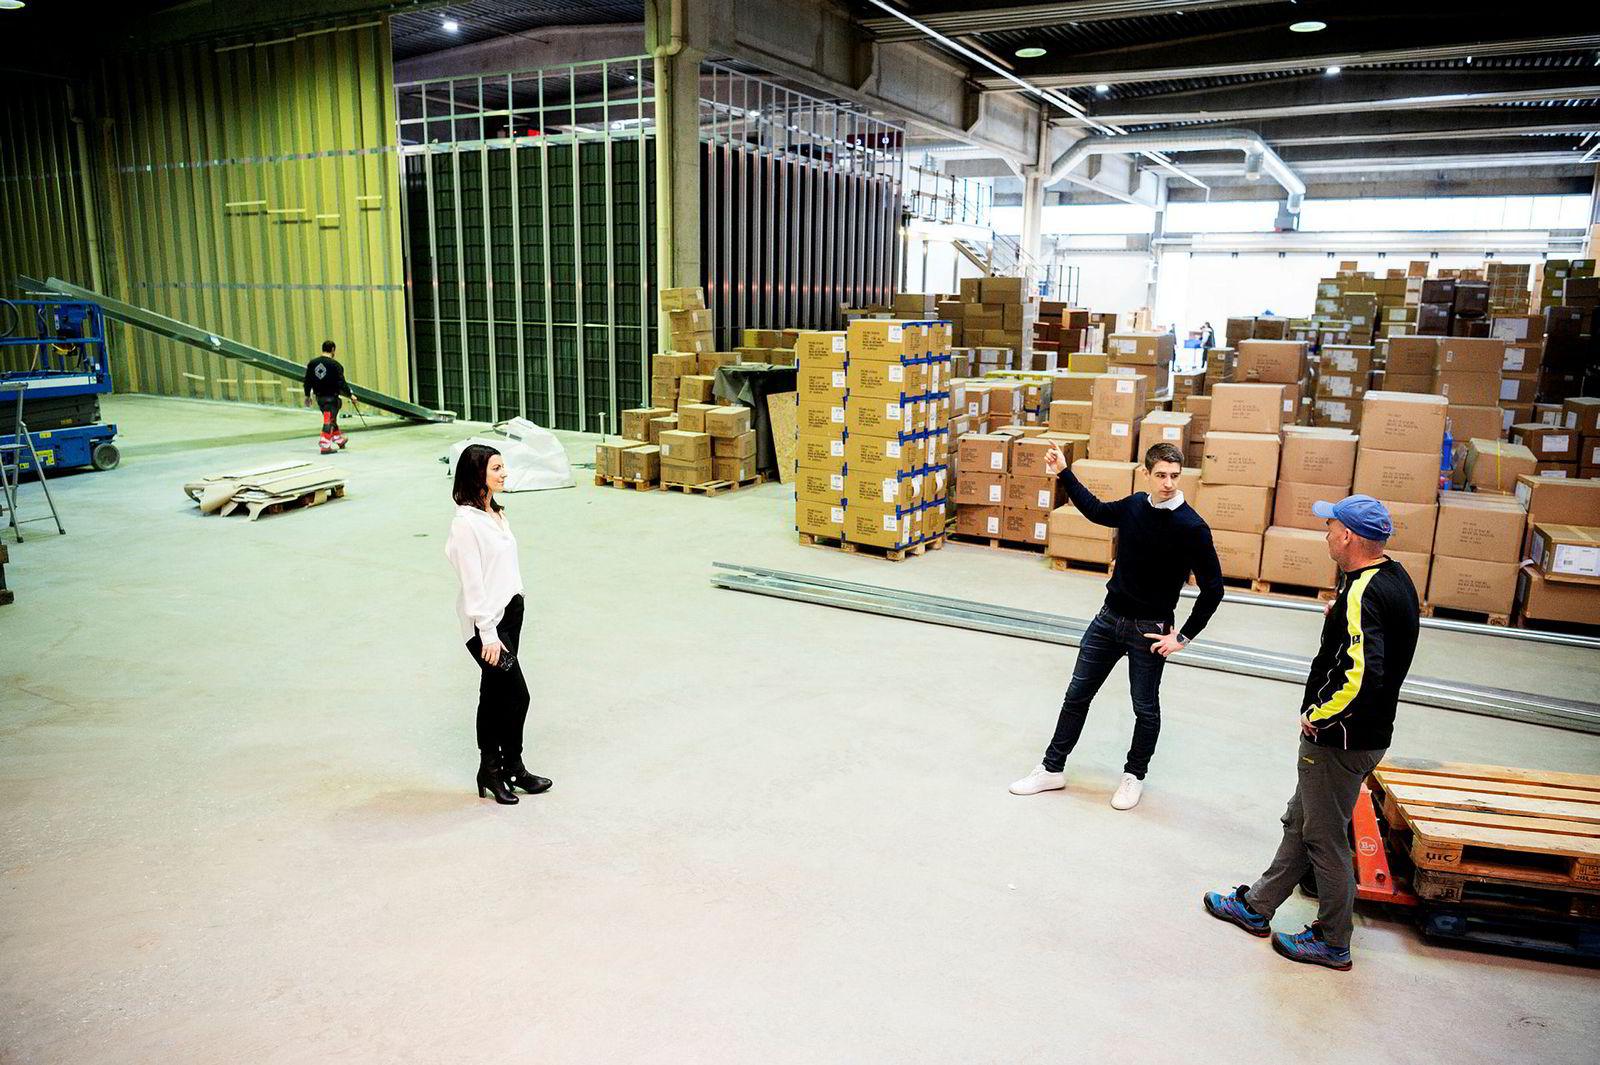 – Her kan vi utvide lageret, sier daglig leder Sindre Landevåg i Get Inspired (i midten) om selskapets lokaler i Fossegrenda ved Trondheim. Til venstre, gründer og forretningsutvikler Silje Landevåg.